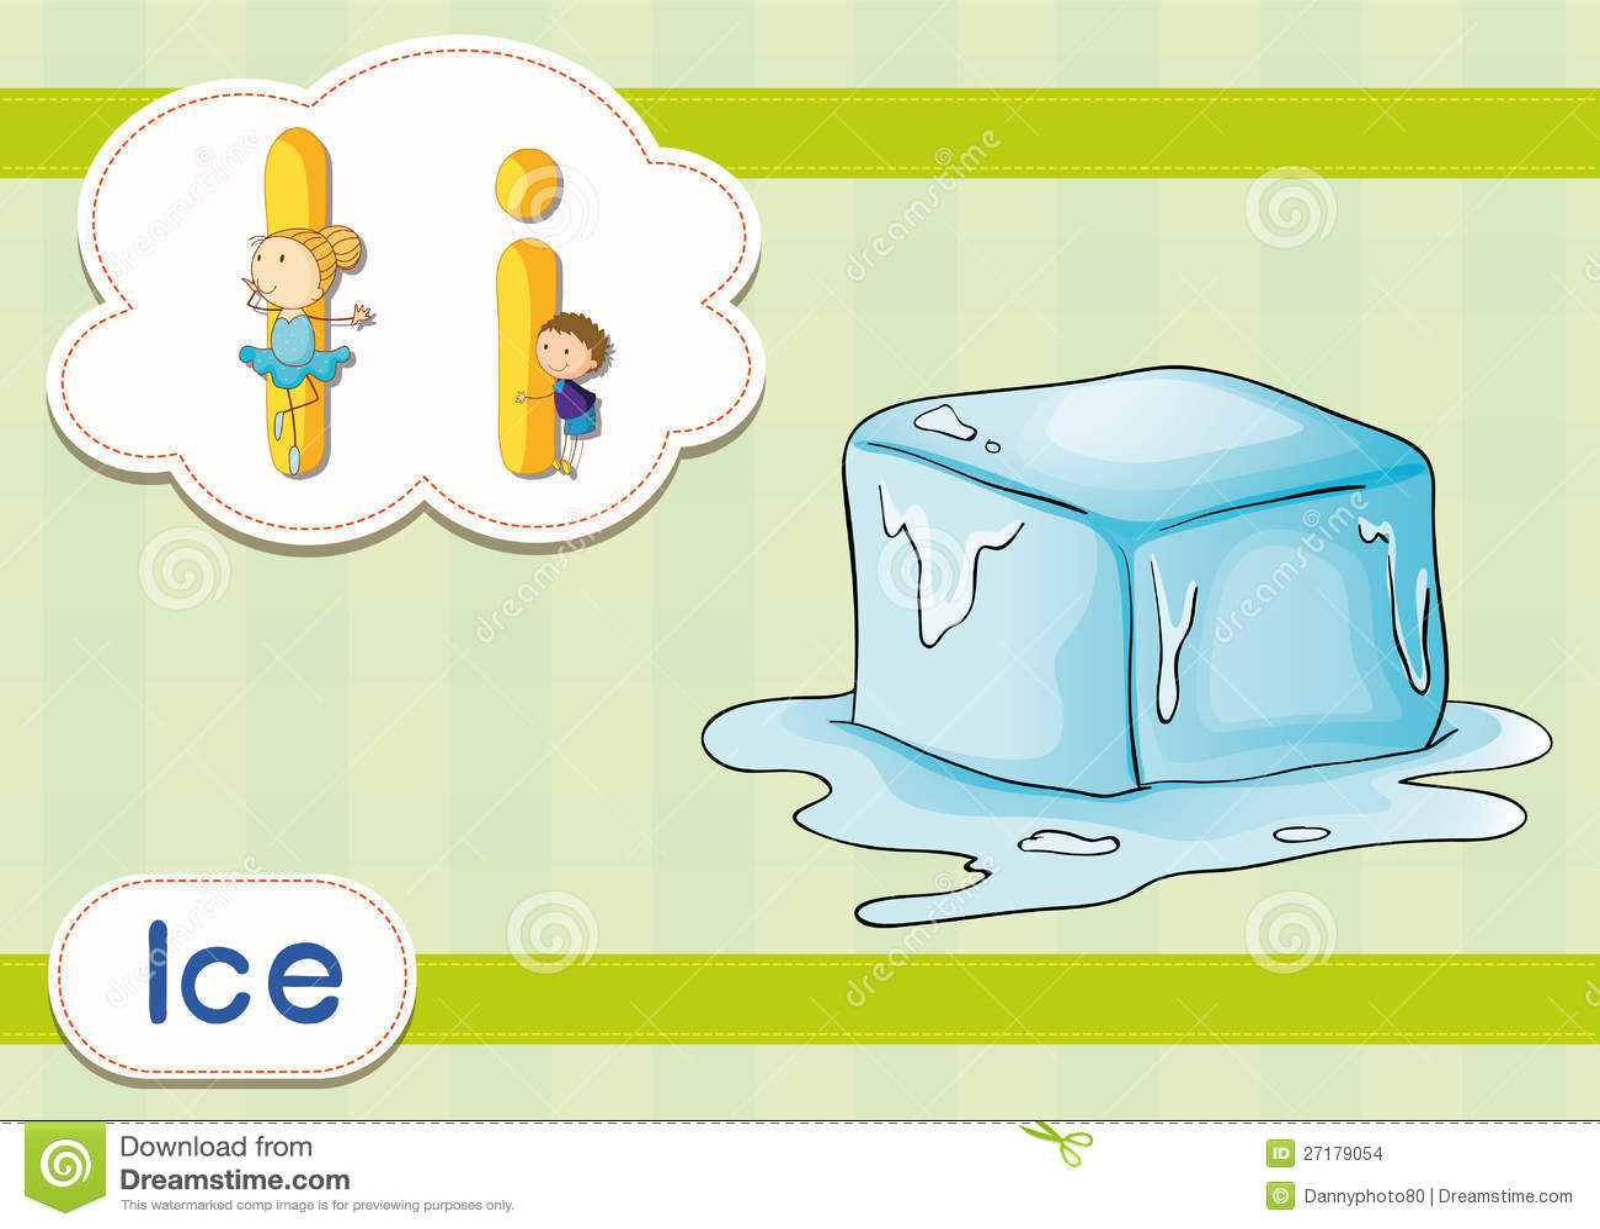 Vocabulary Worksheet Stock Images